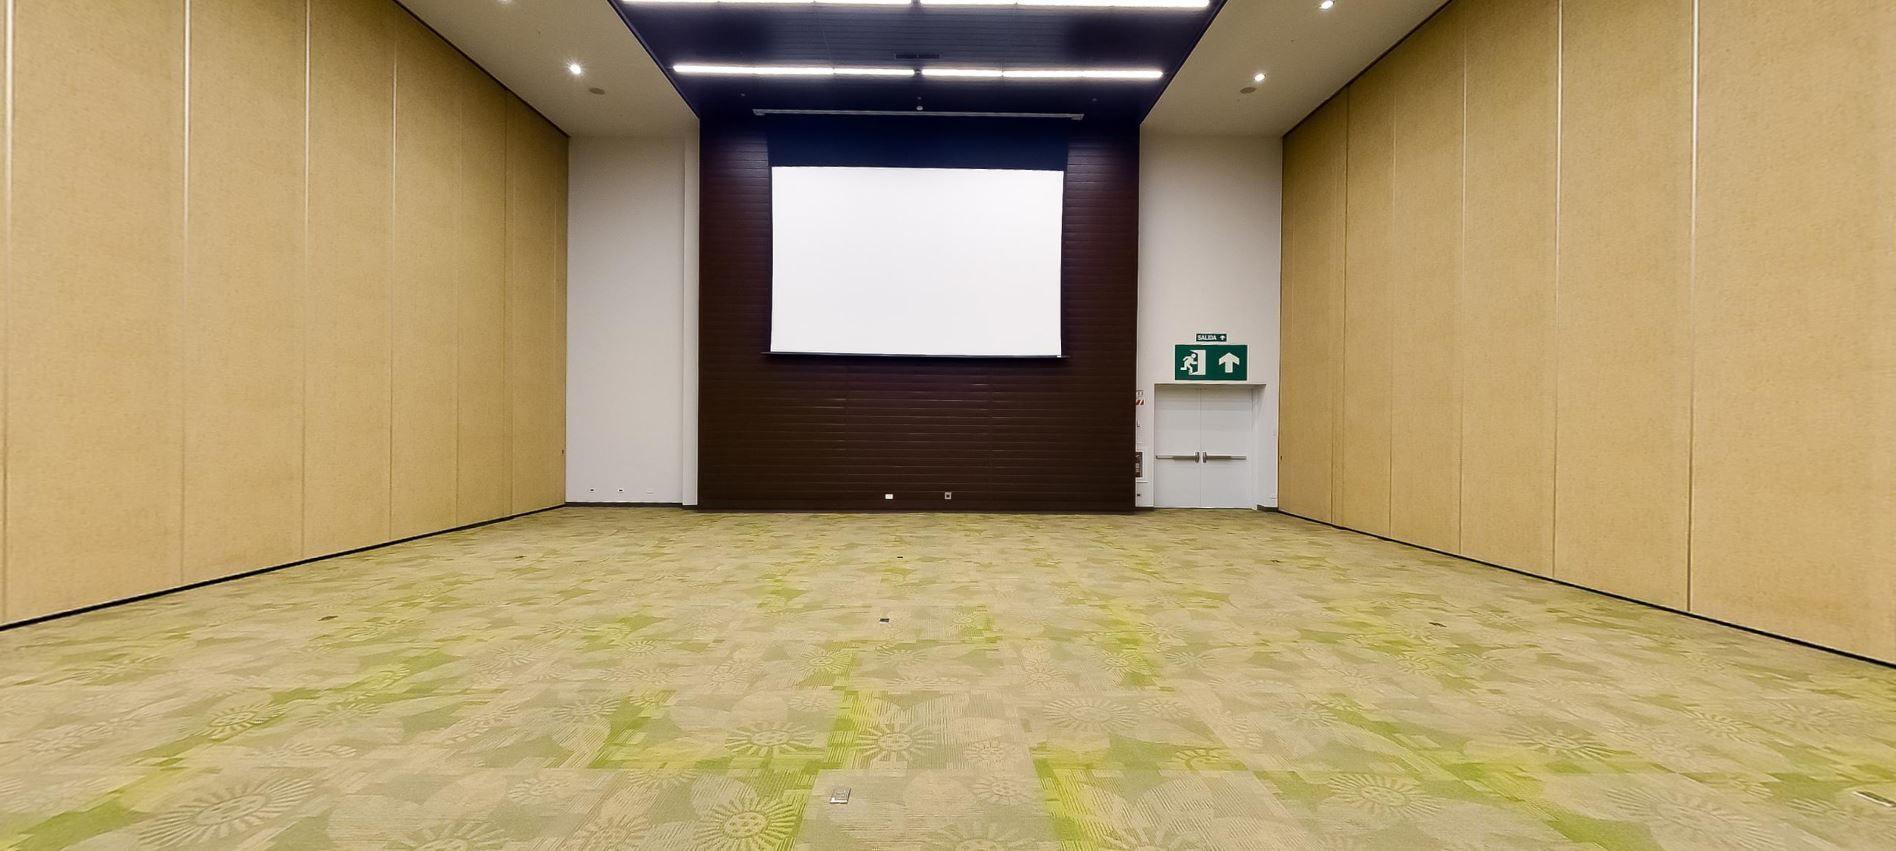 sala central